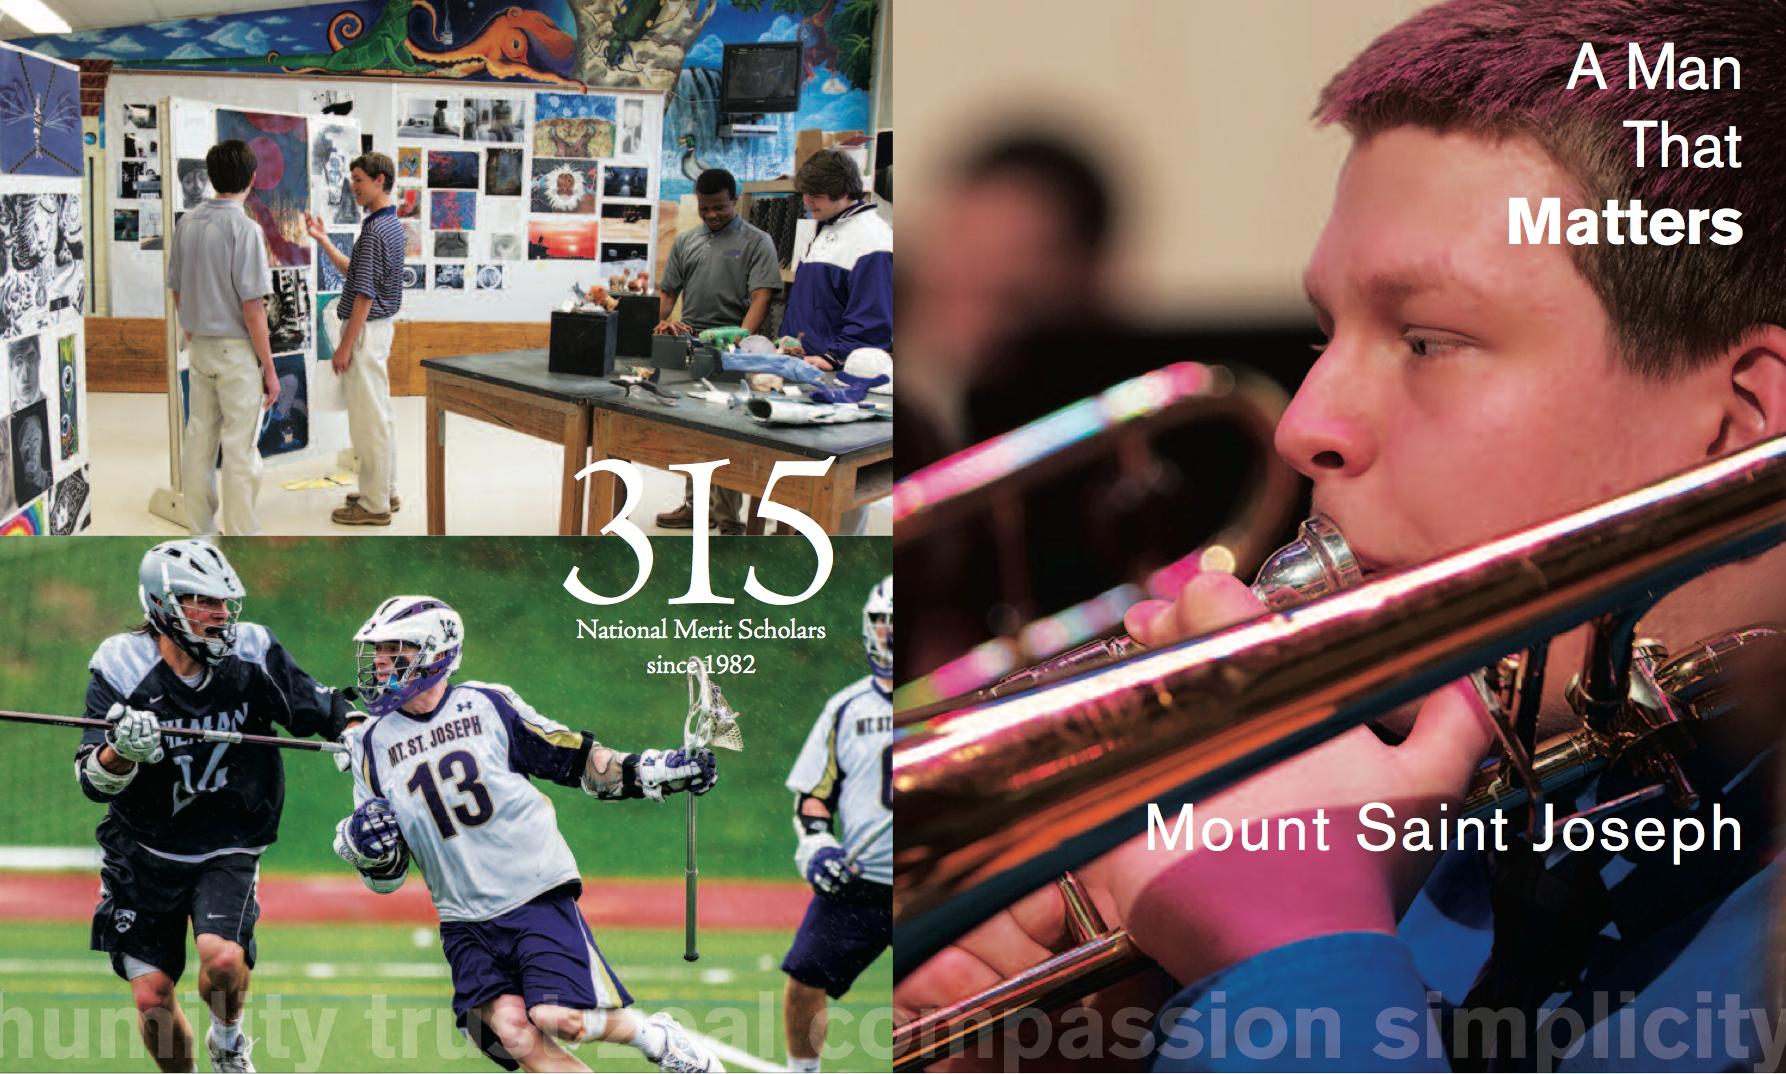 Mount Saint Joseph High School admissions